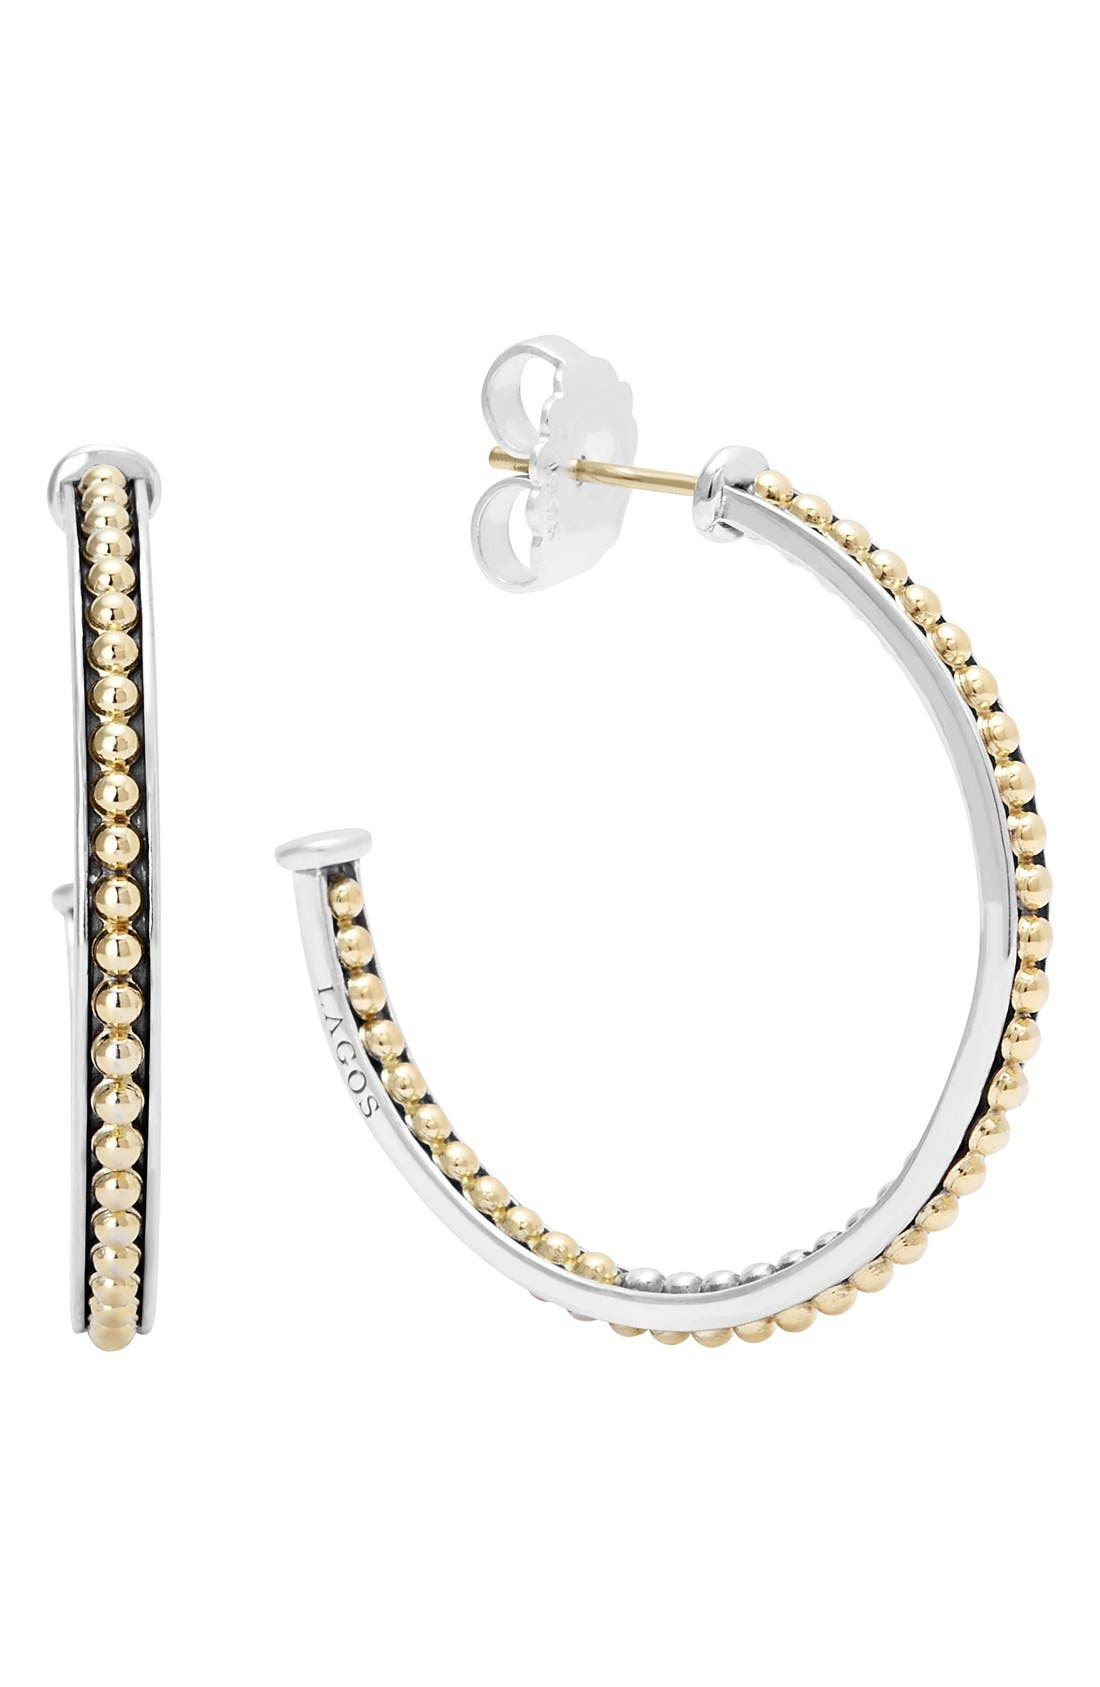 'Enso' Caviar Hoop Earrings,                             Main thumbnail 1, color,                             SILVER/ GOLD